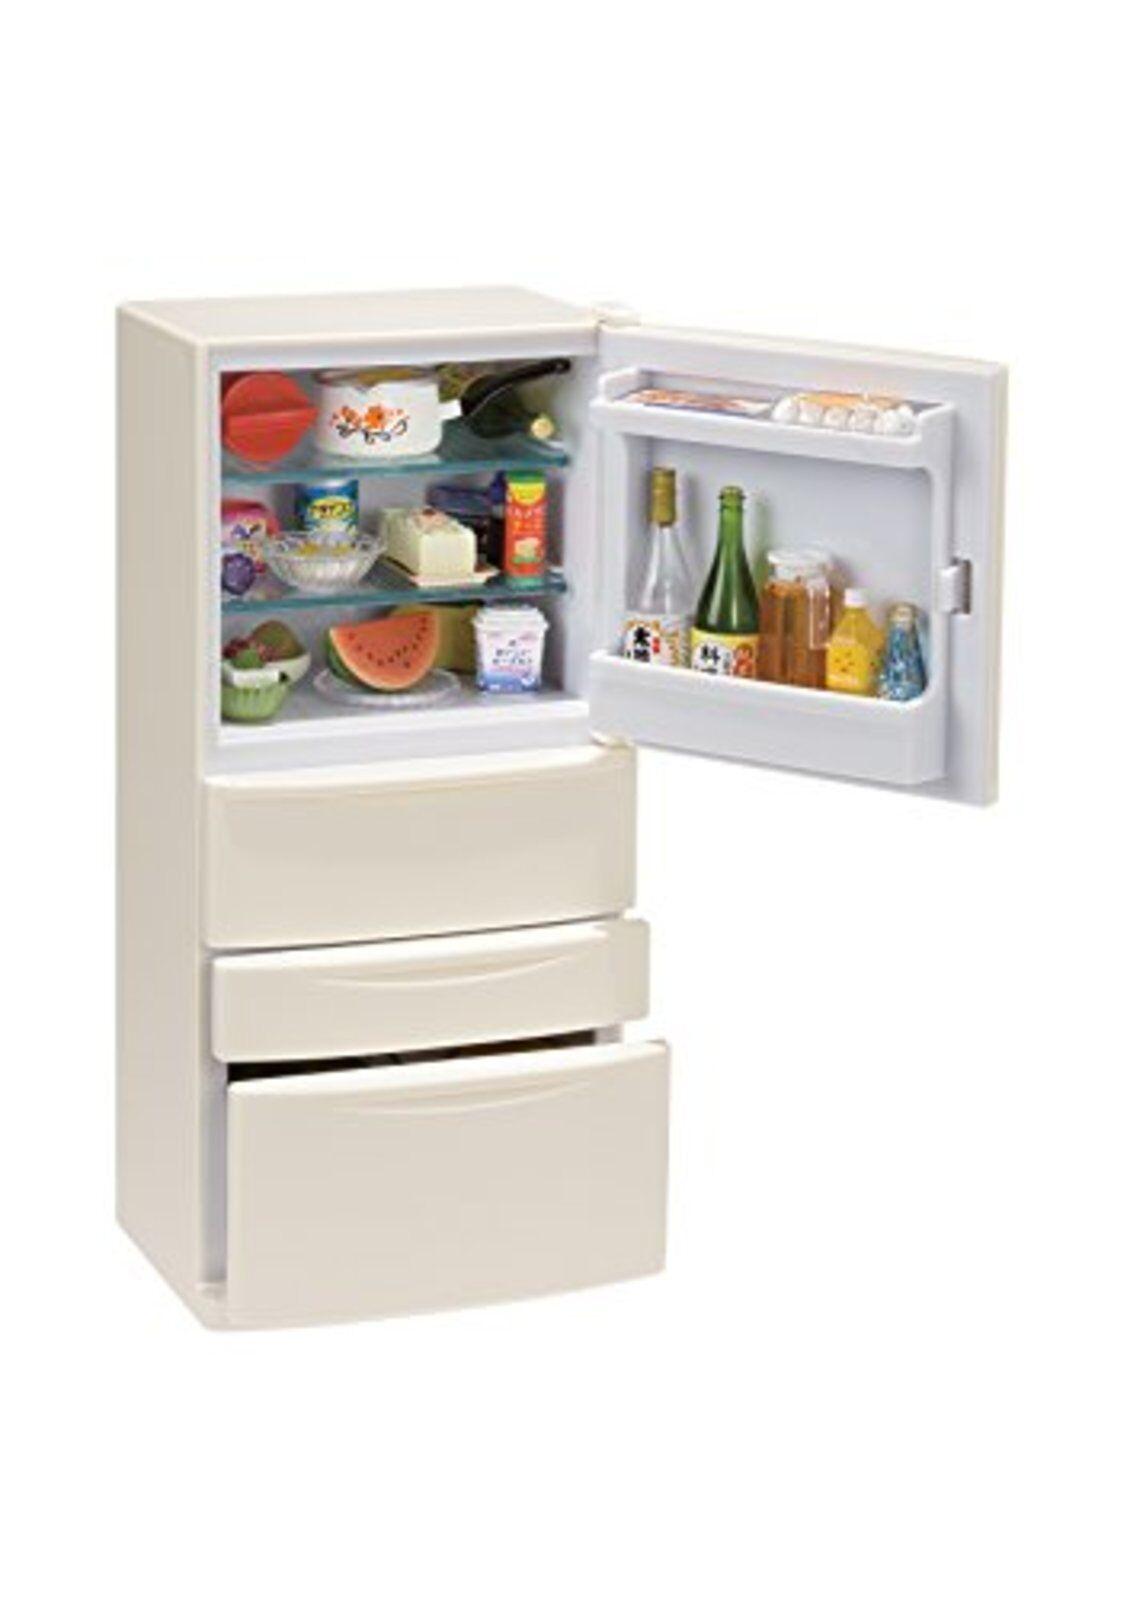 Re-Siet Petit Probe Serie Kühlschrank Set Miniatur Figures Aufbewahrung F S